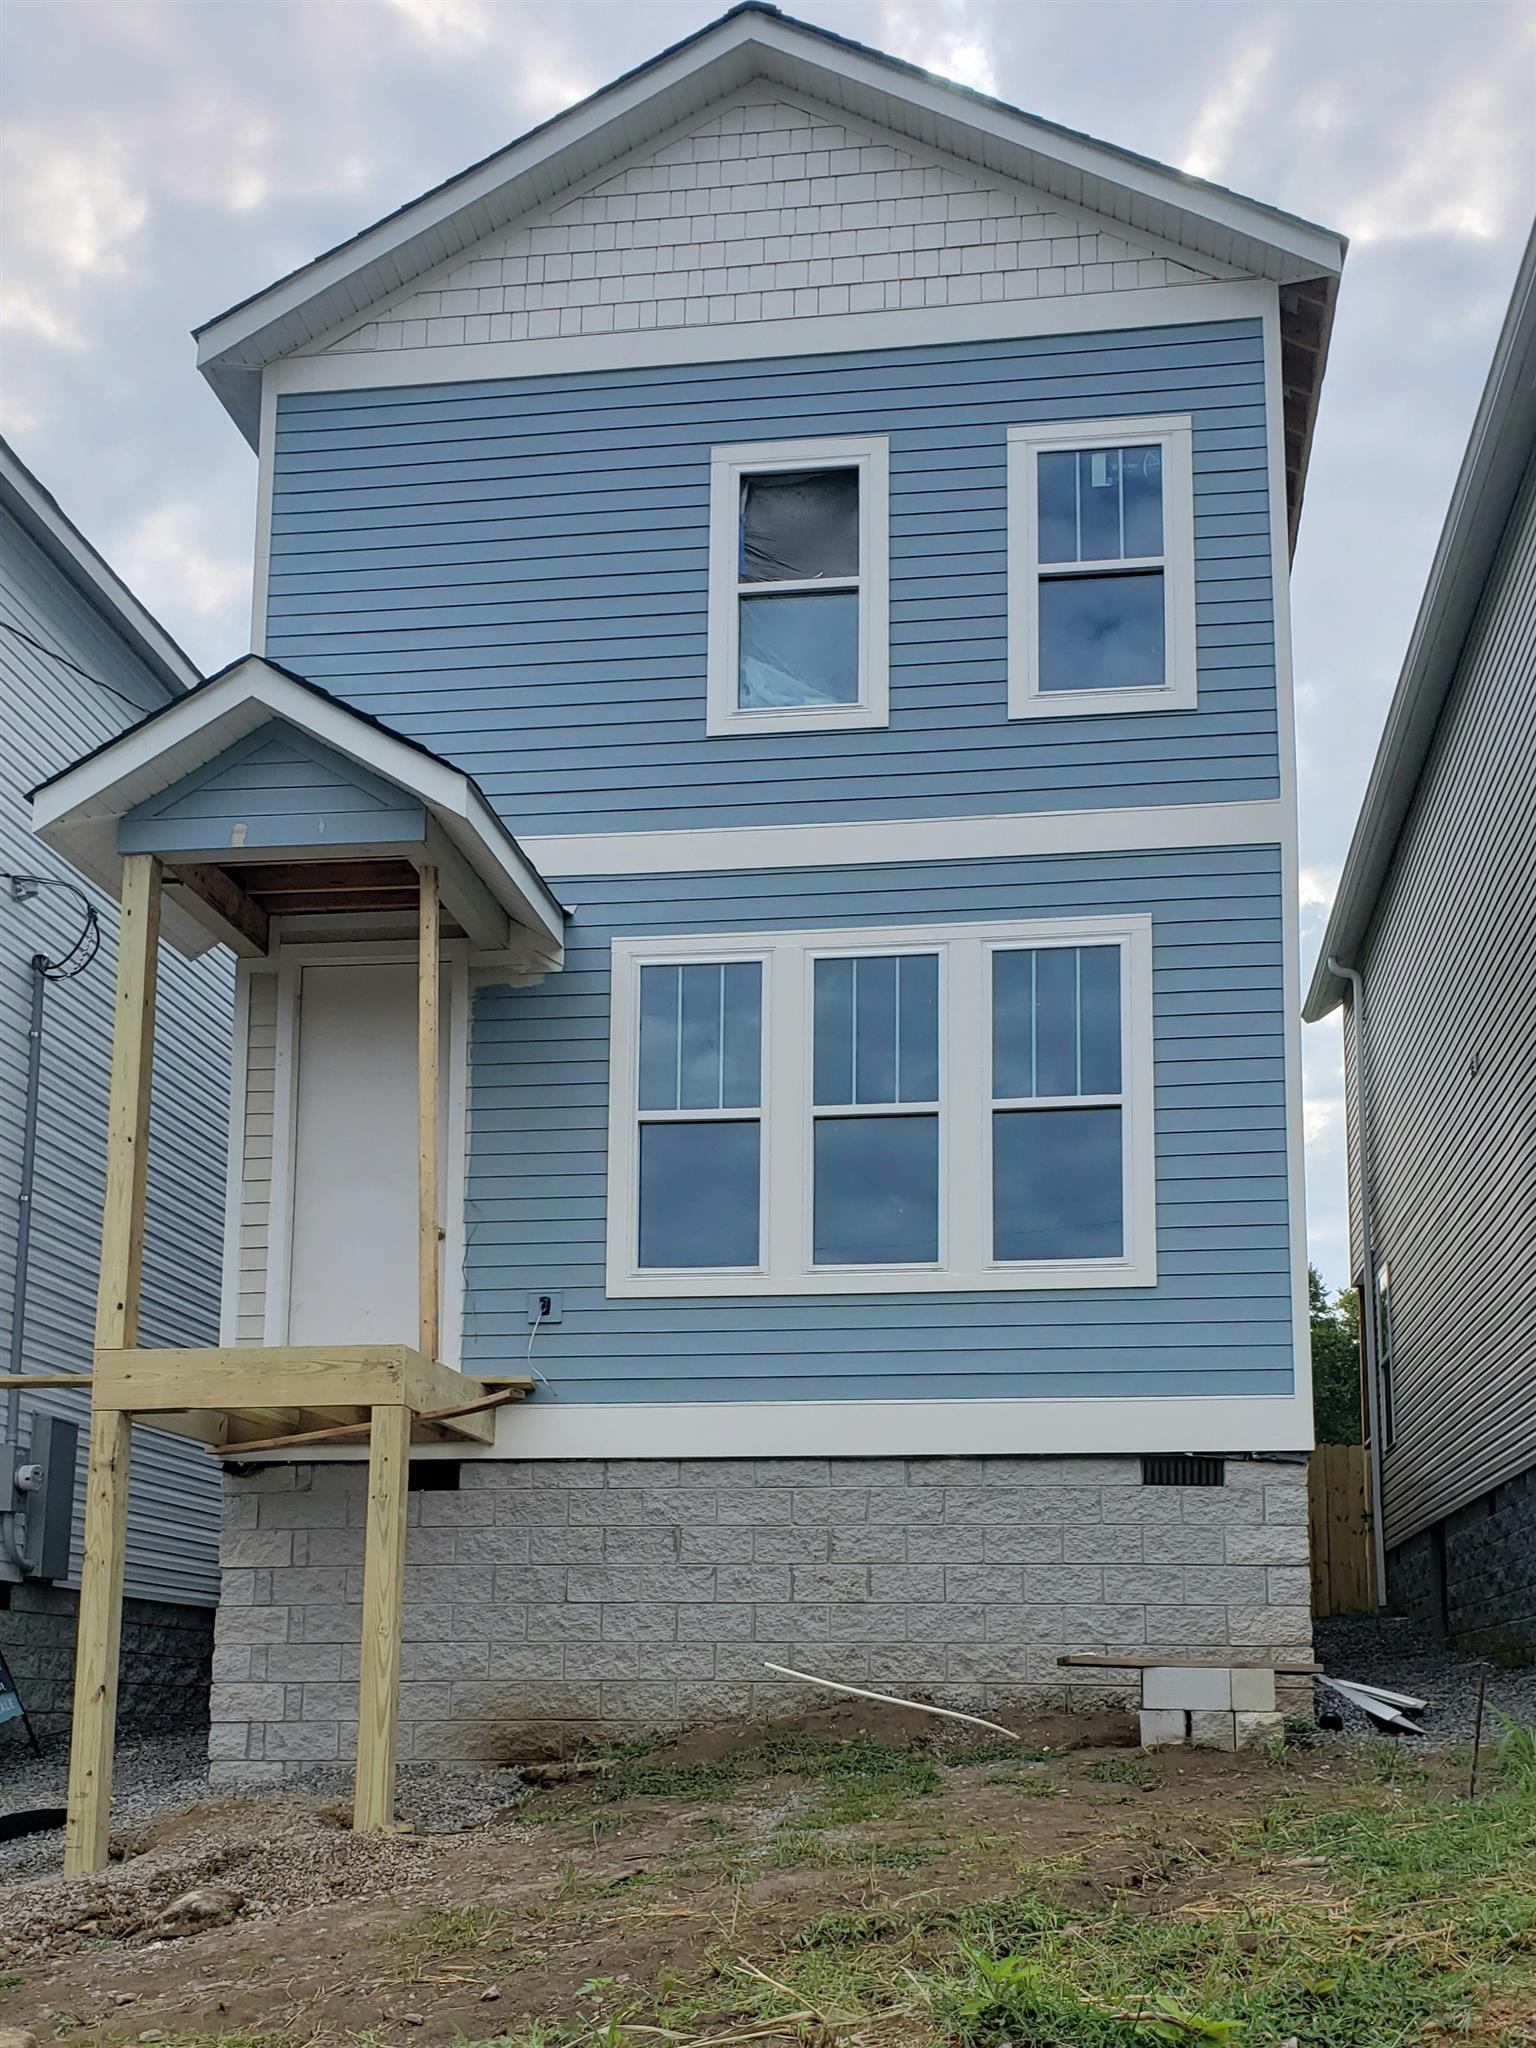 225B Hillcrest Dr, Madison, TN 37115 - Madison, TN real estate listing